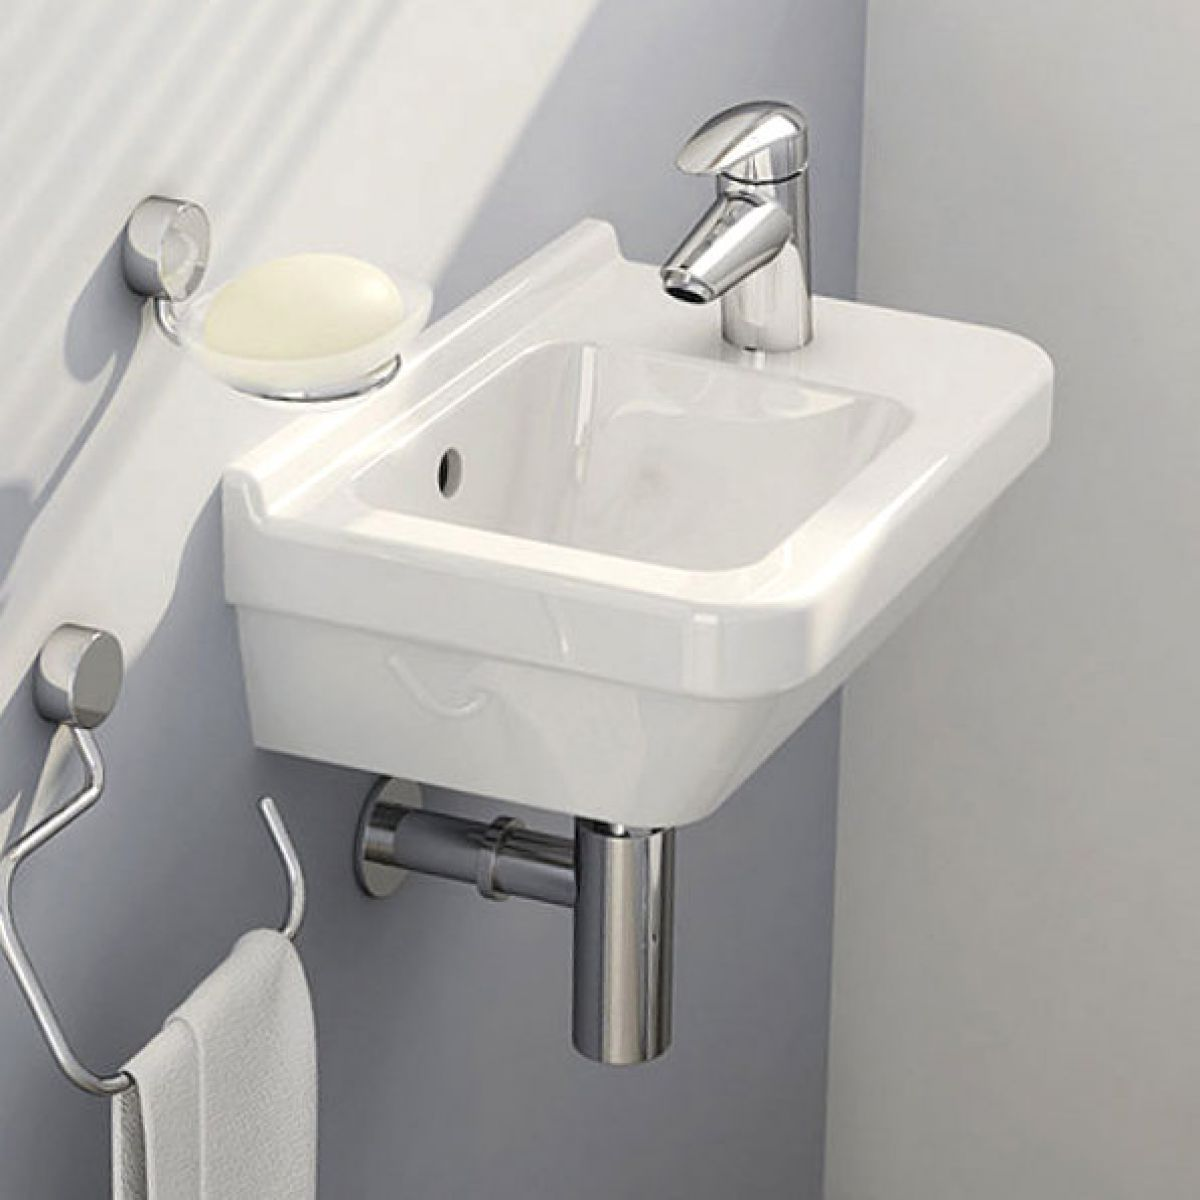 Vitra S50 Compact Cloakroom Basin